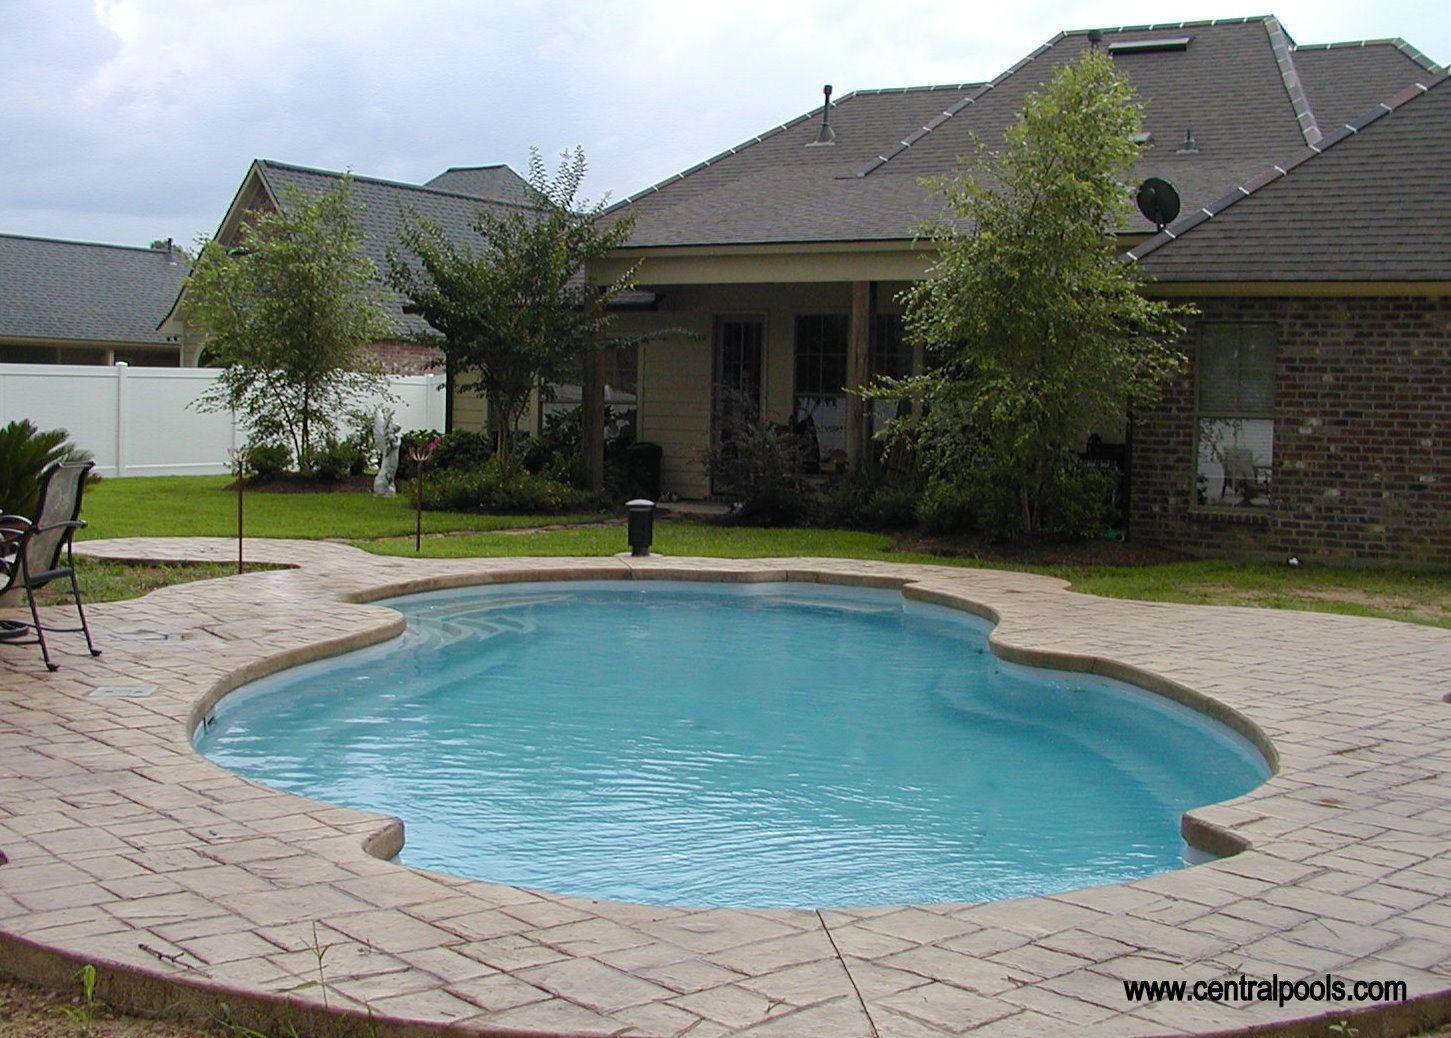 Central Pools Inc Fiberglass Swimming Pool Centralpools Com Pools Fiberglass Swimming Pools Fiberglass Pools Pool Houses